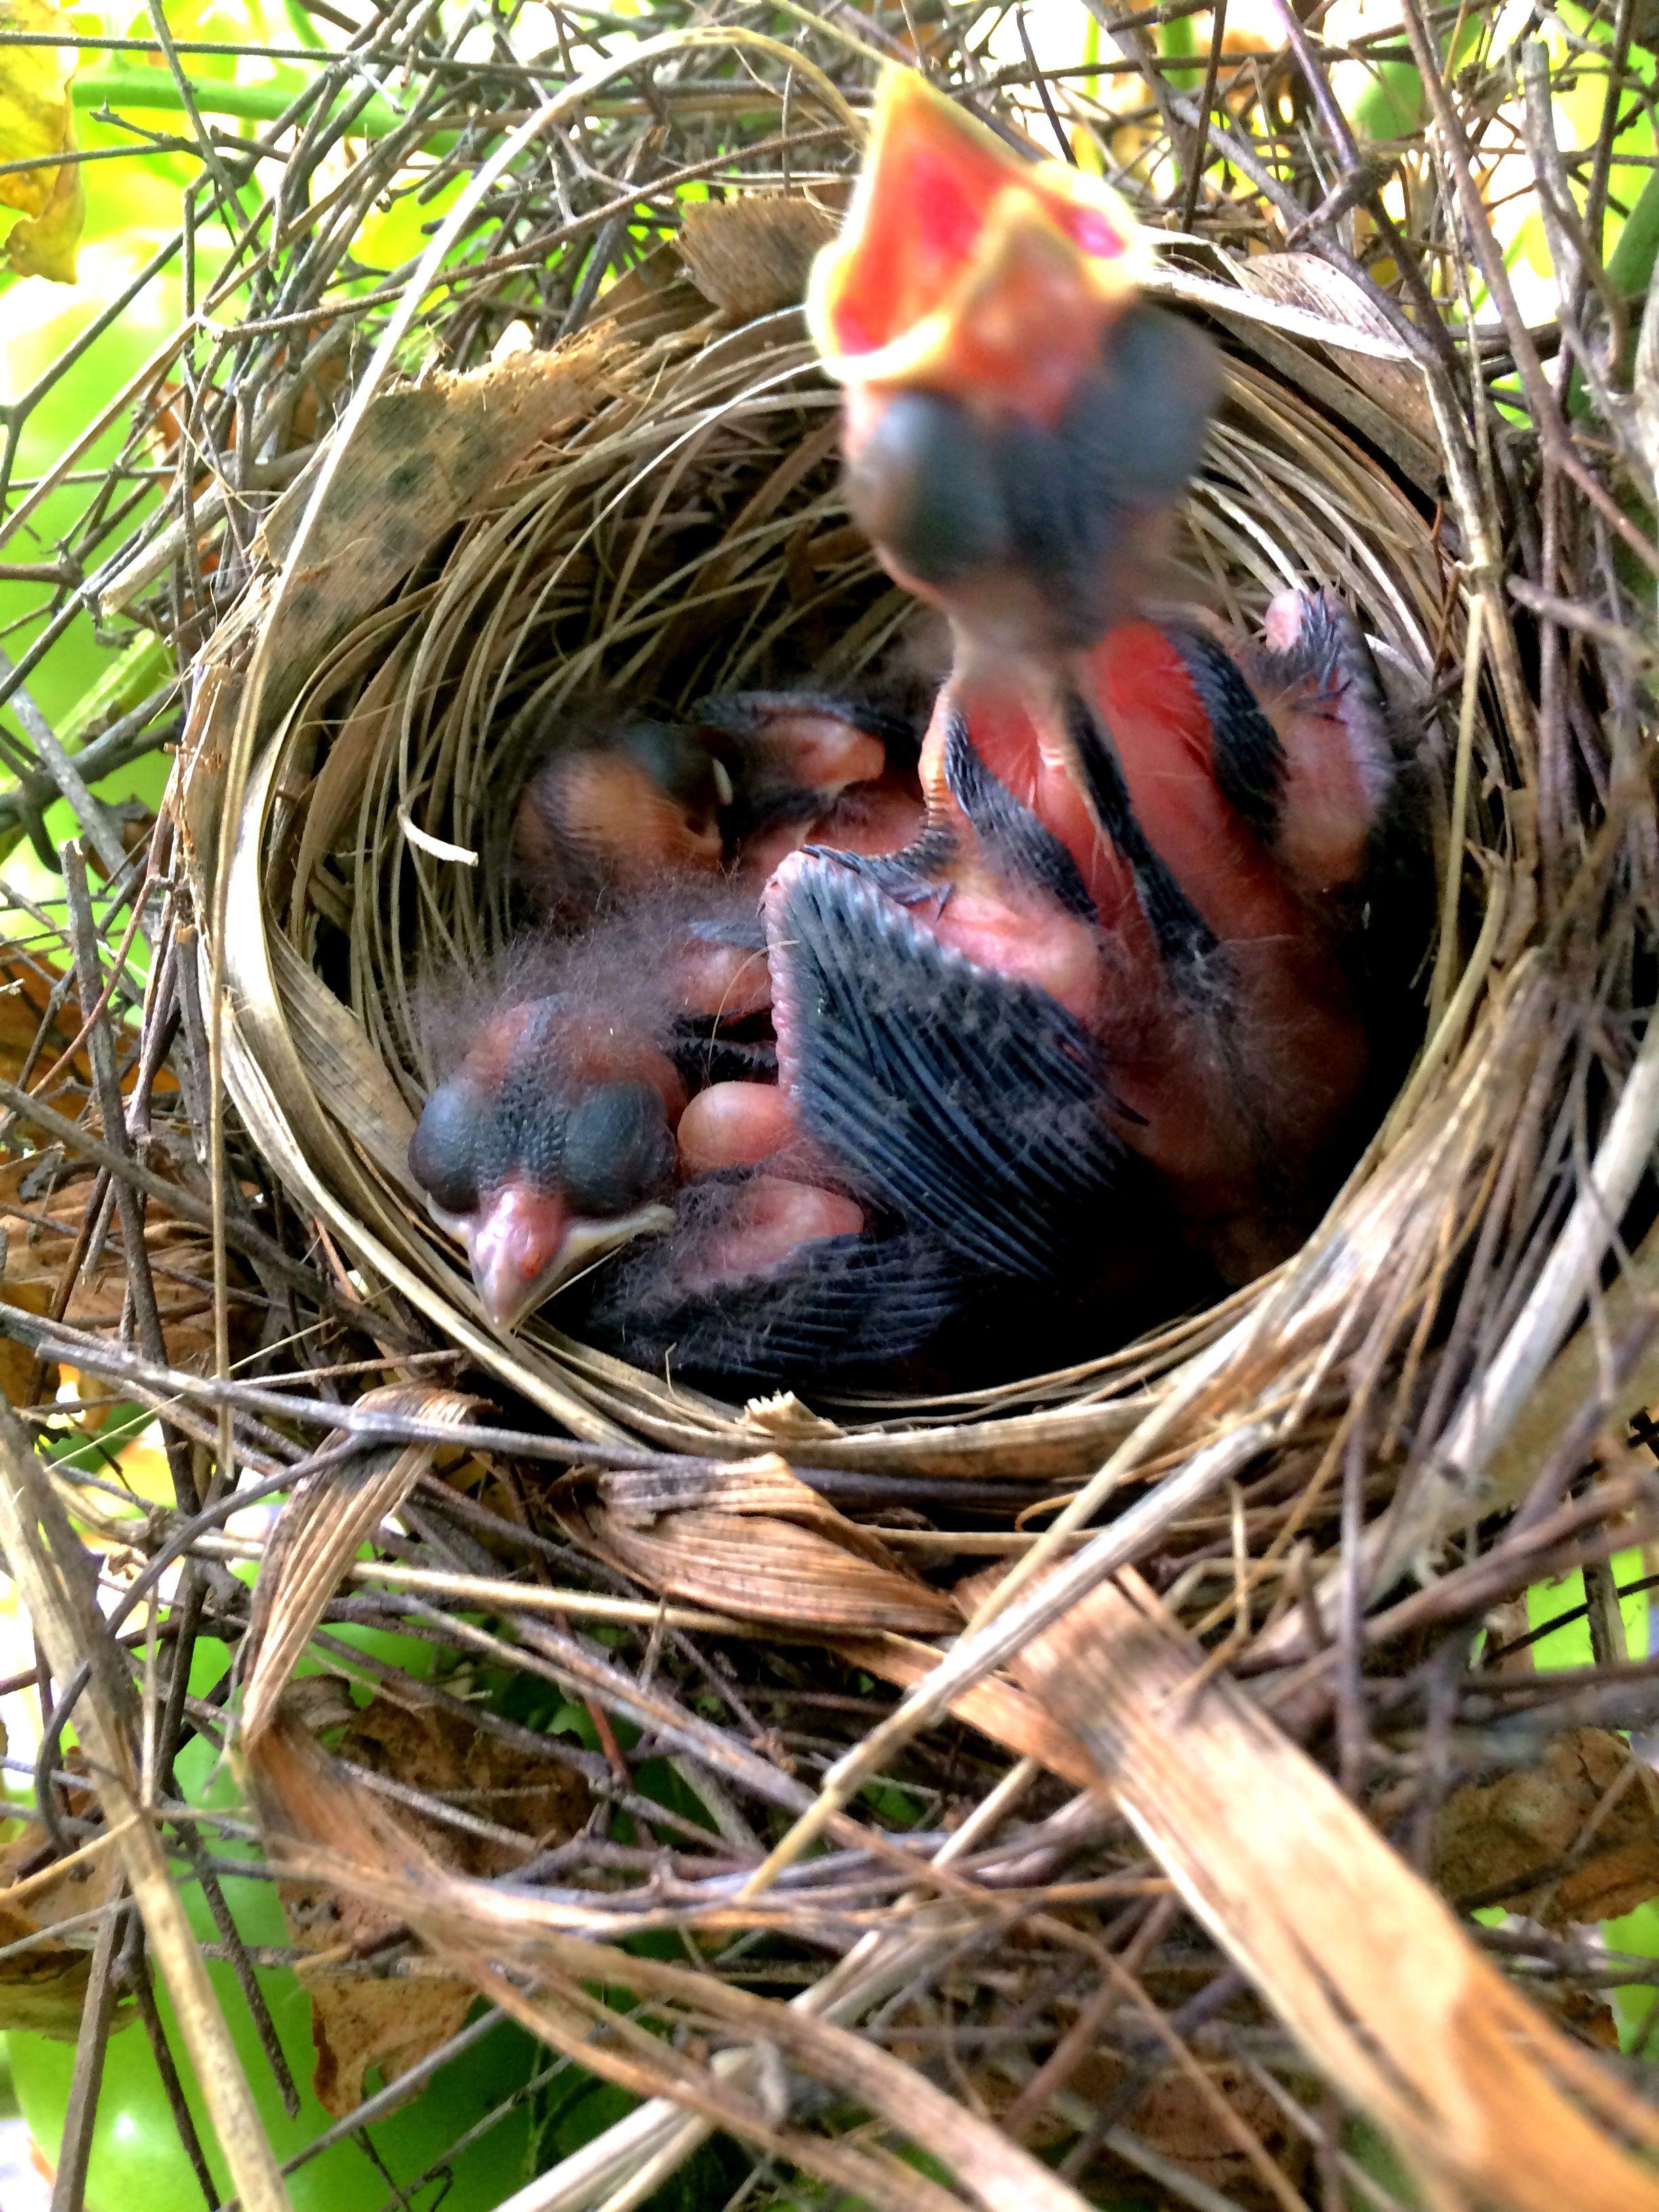 Pin By Fallinsky On Flowers My Stuff Baby Cardinals Habitats